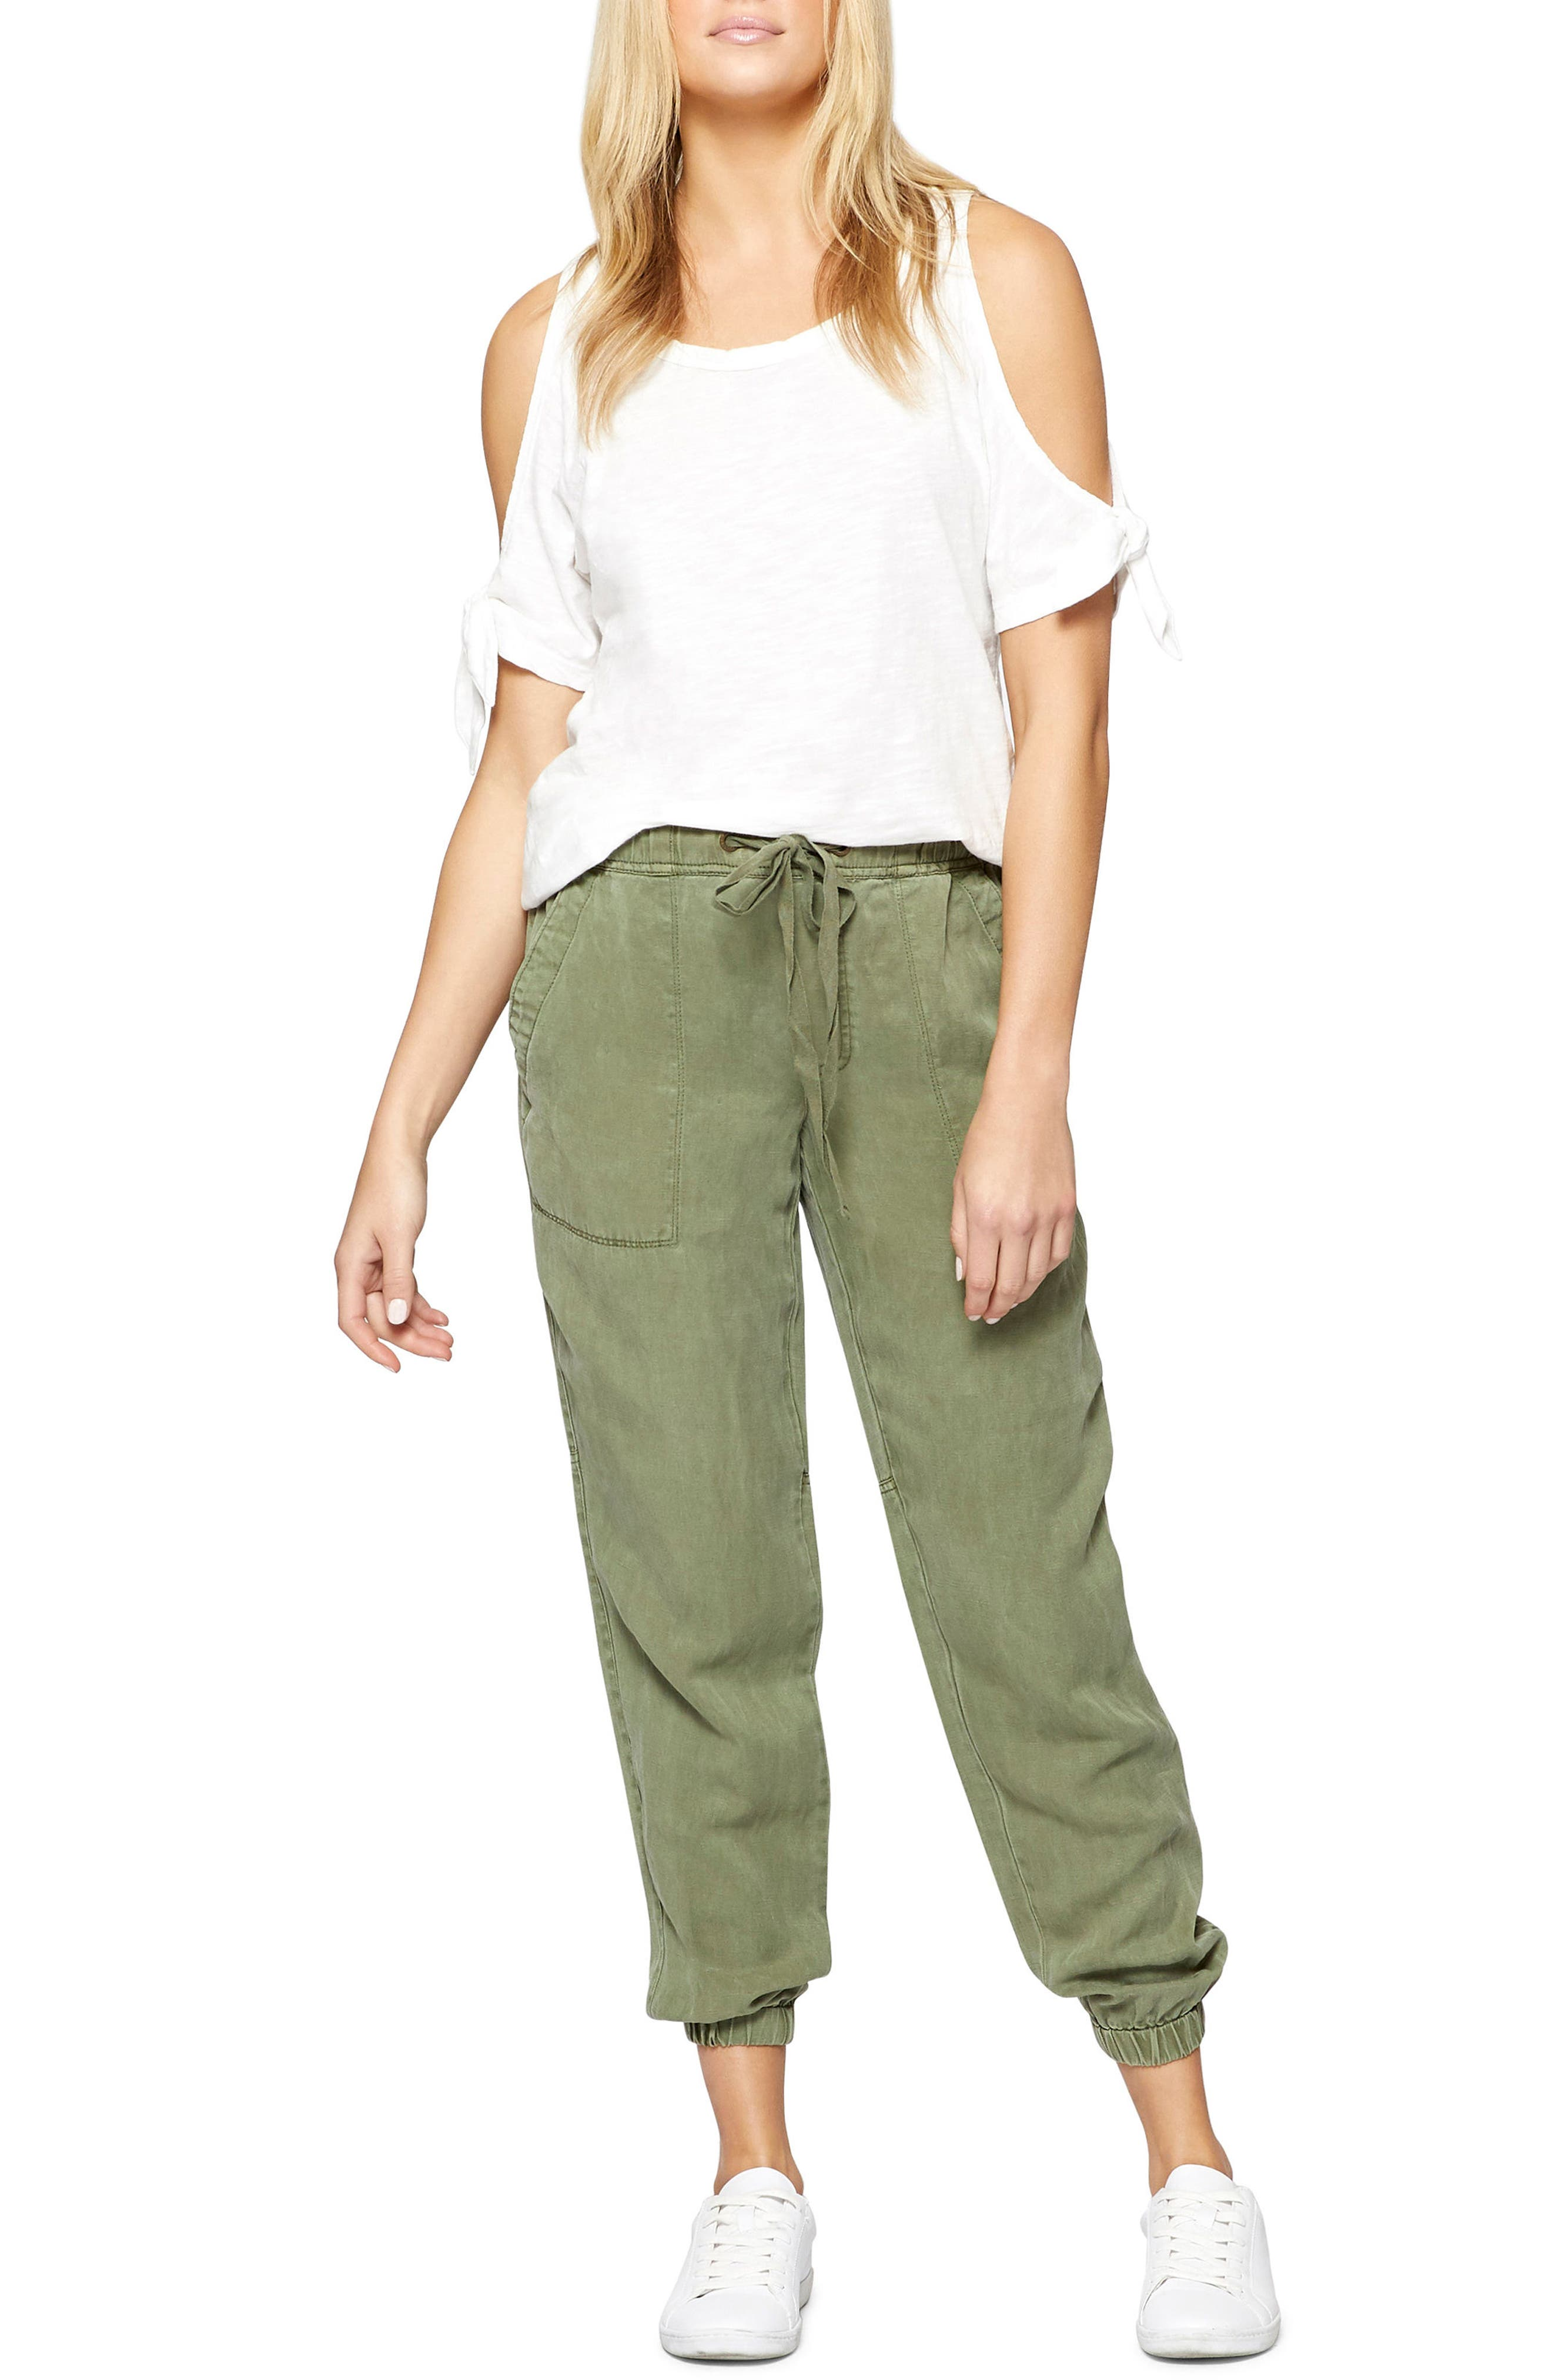 Victory Jogger Linen Blend Pants,                             Alternate thumbnail 3, color,                             Cadet